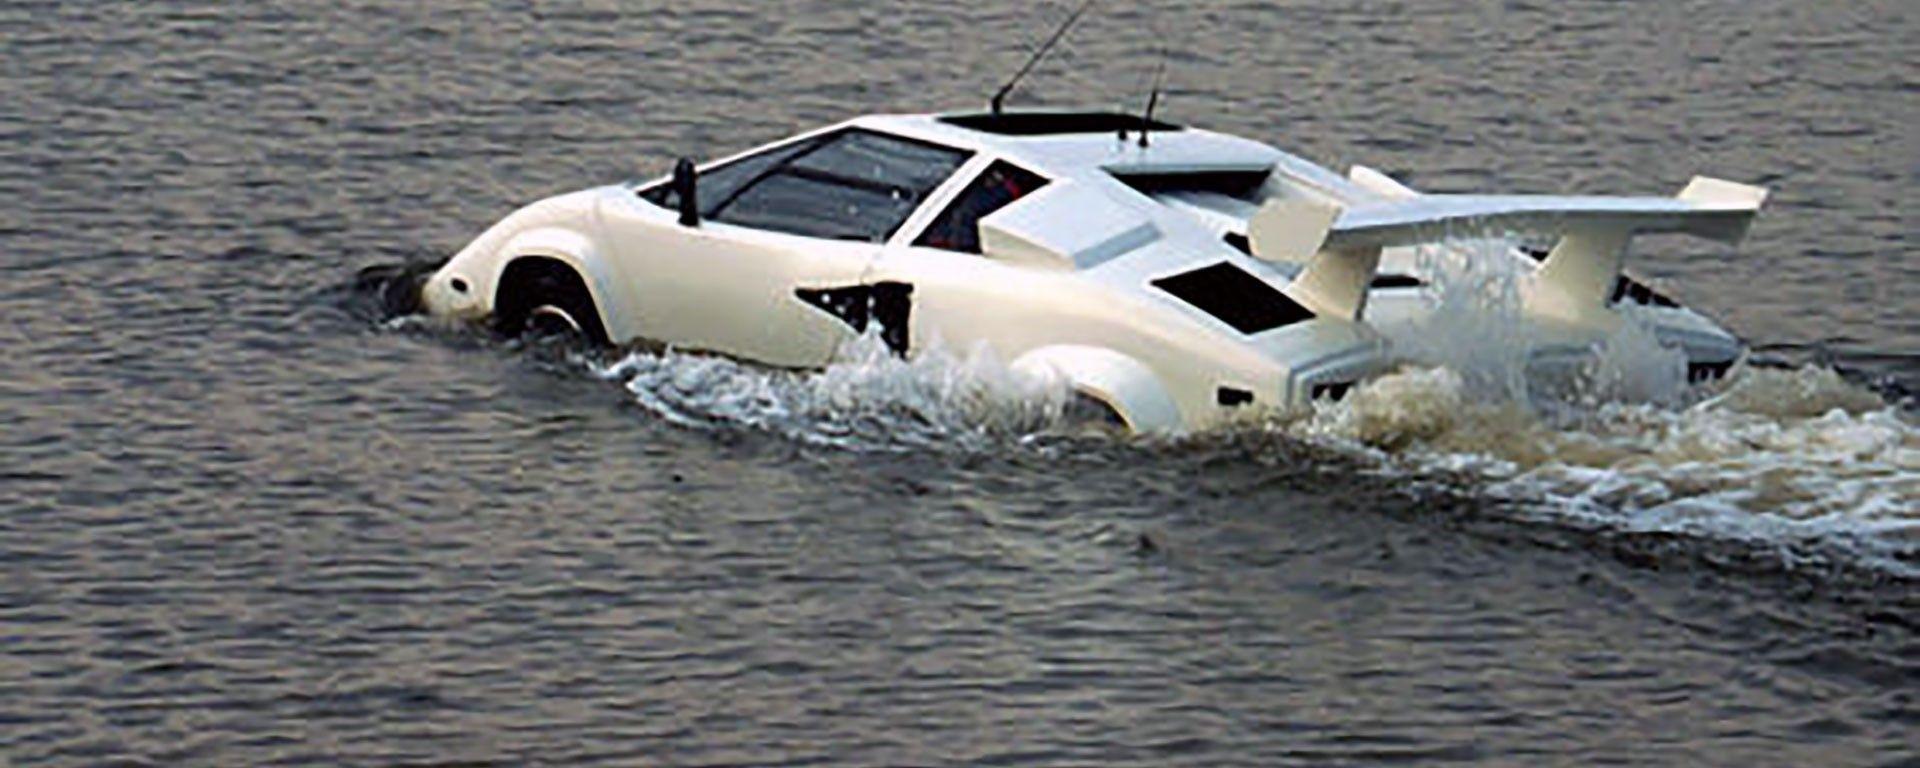 Lamborghini Countach anfibia